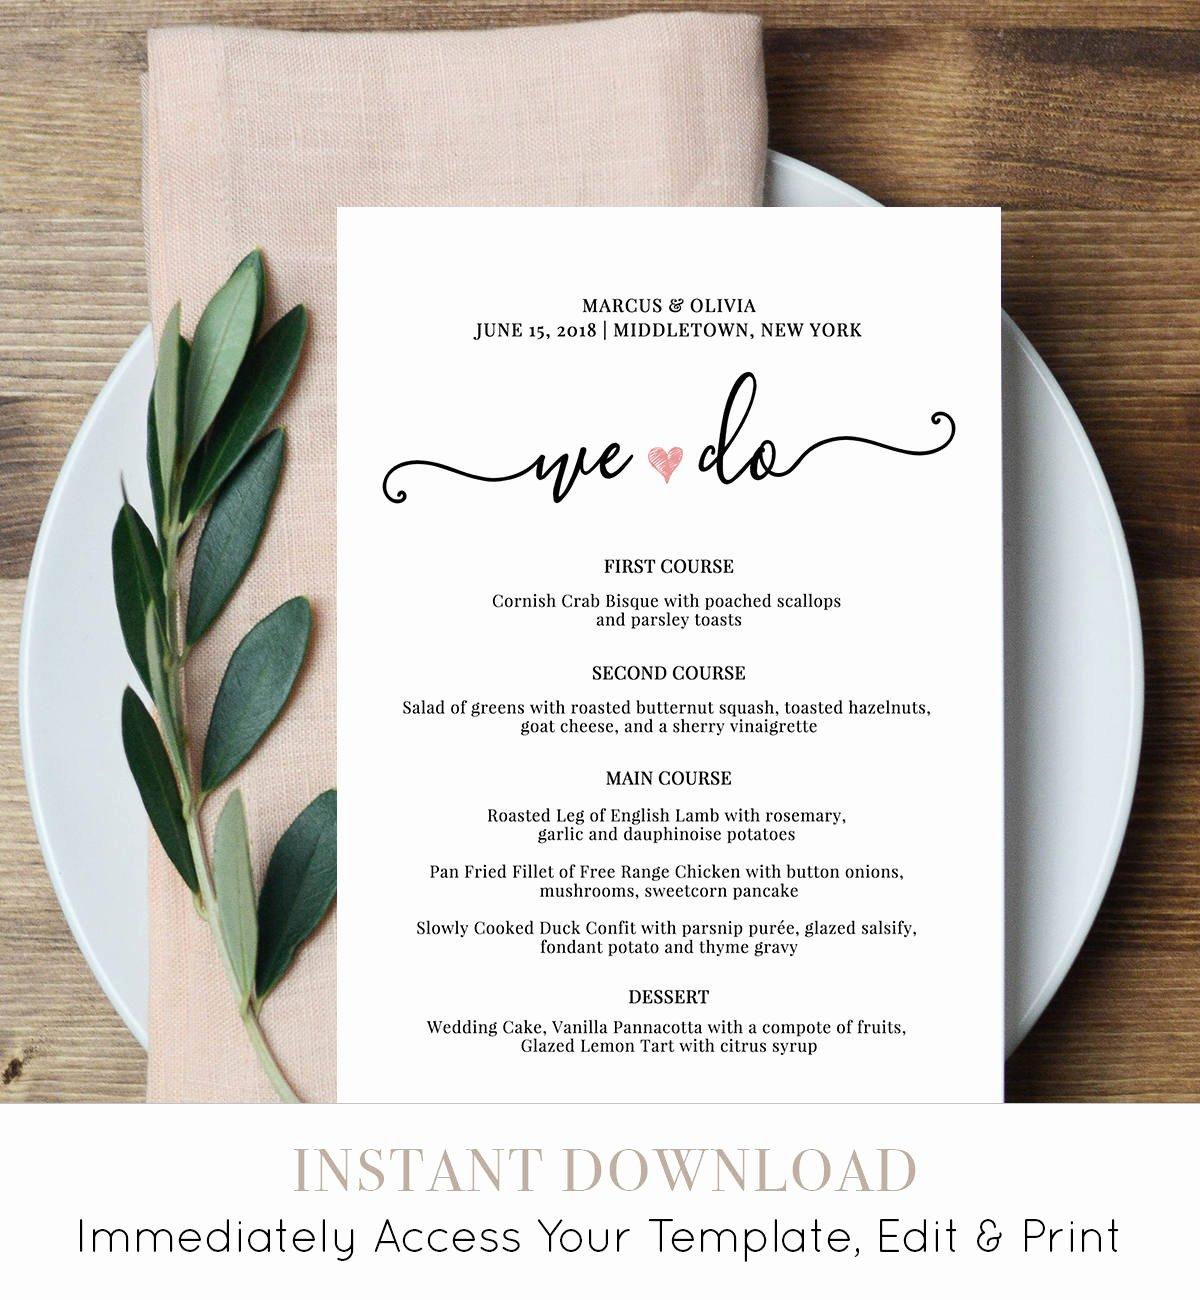 Wedding Menu Cards Template Awesome Wedding Menu Card Template We Do Printable Dinner Menu